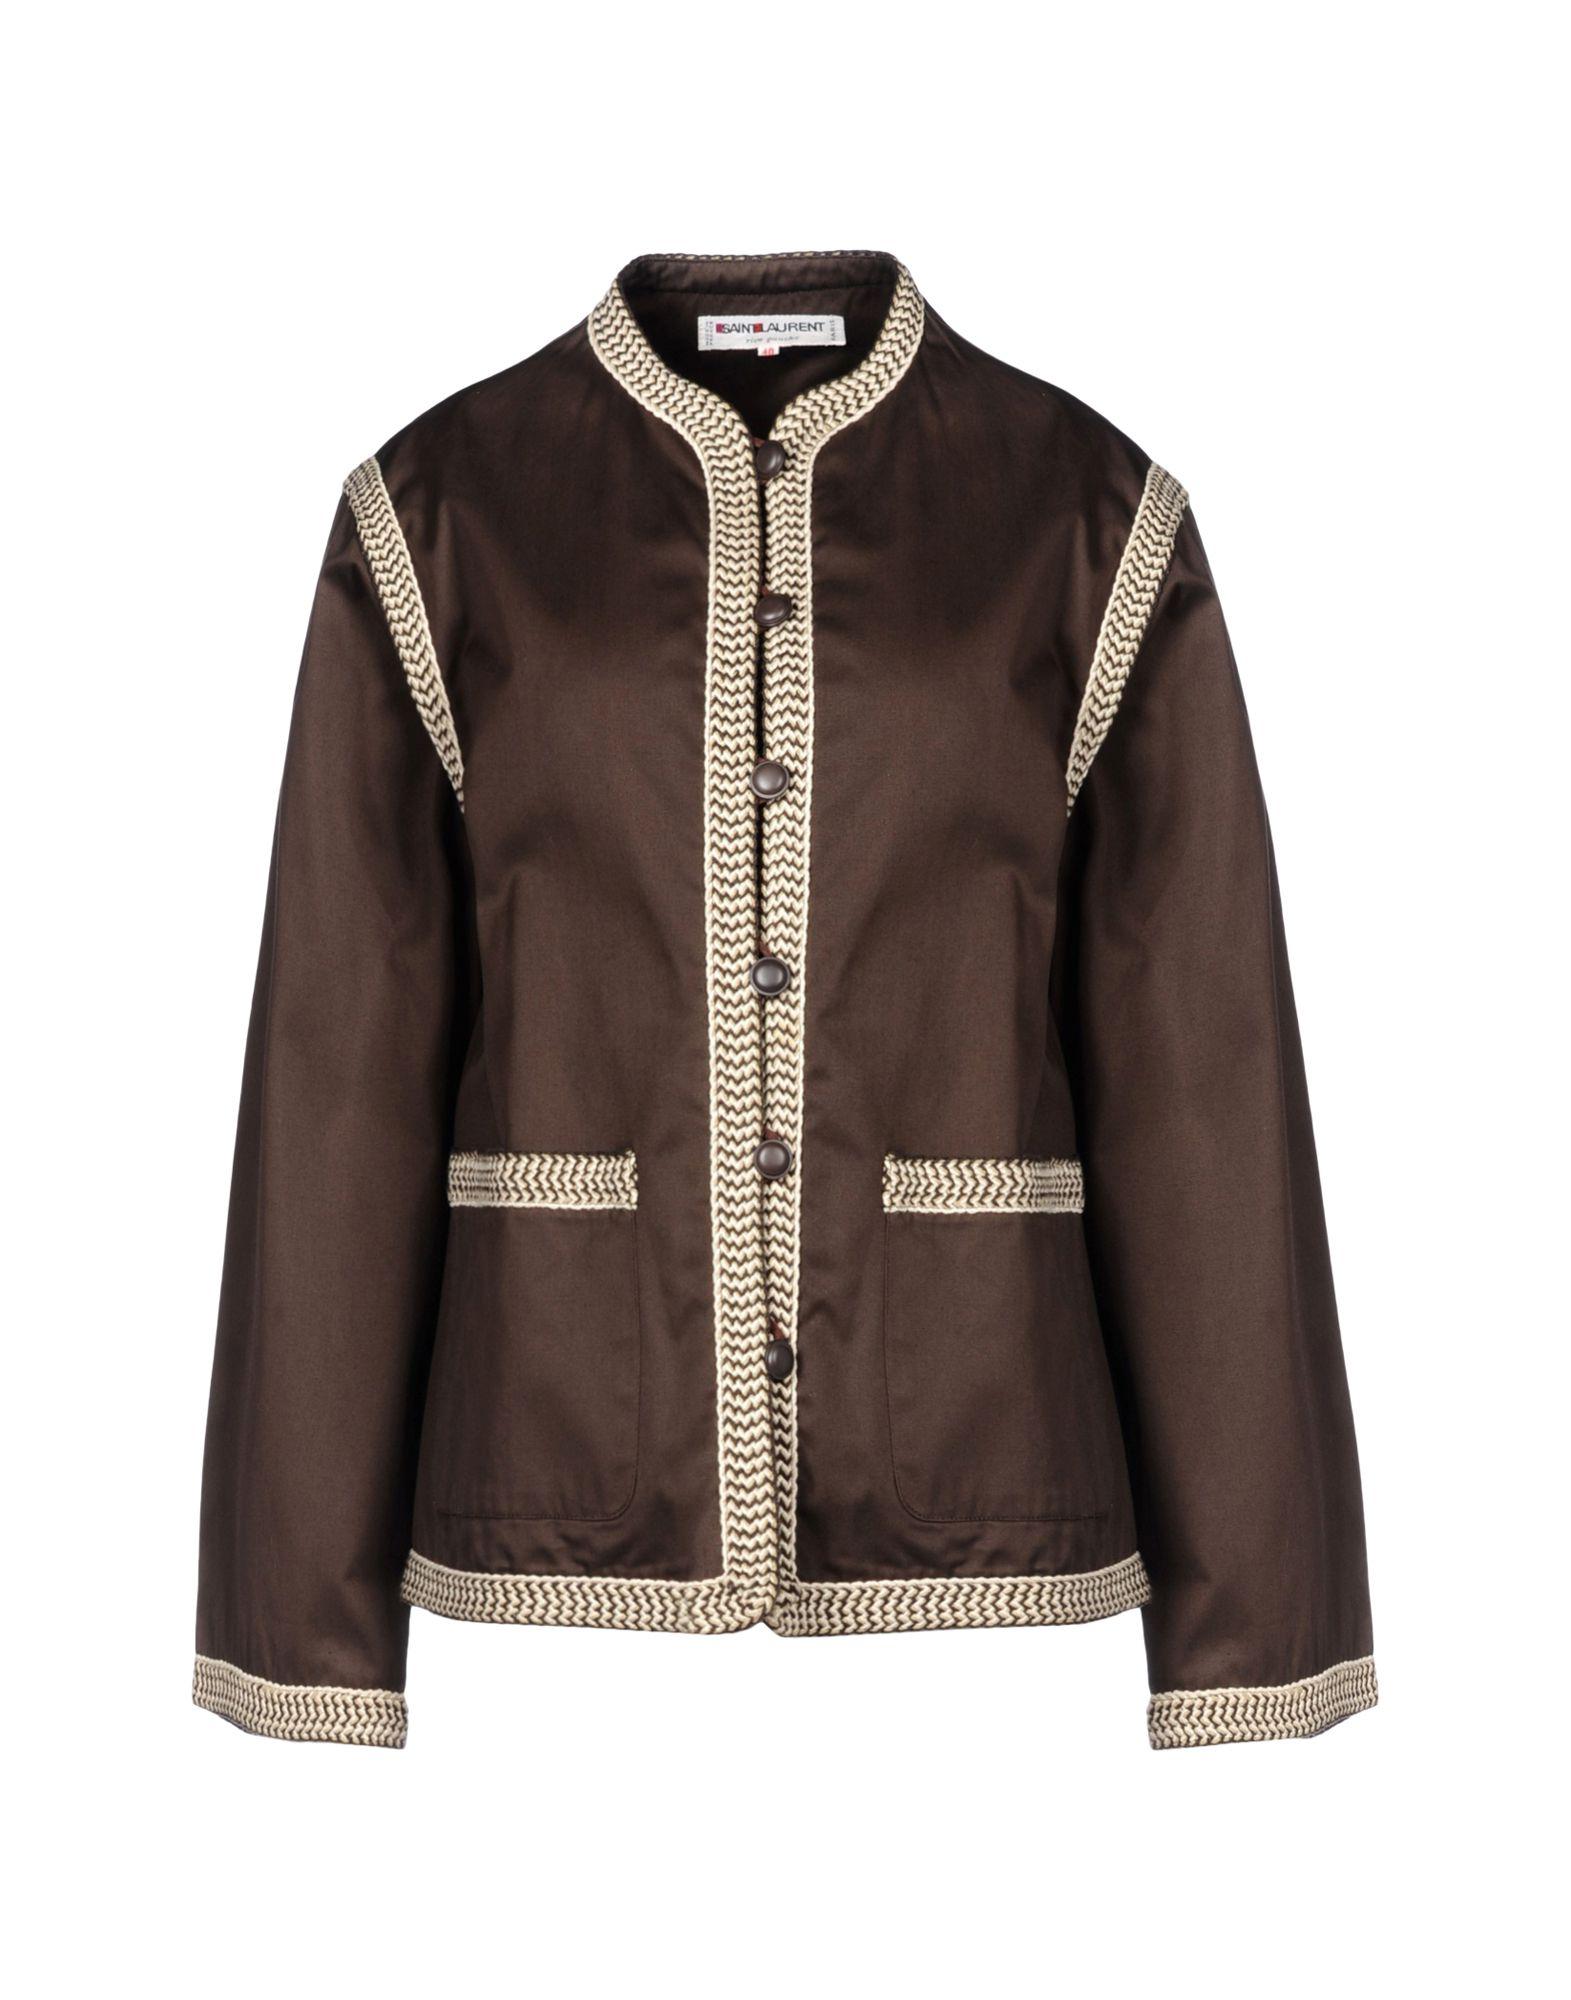 Yves Saint Laurent Rive Gauche Clothing   Lyst?